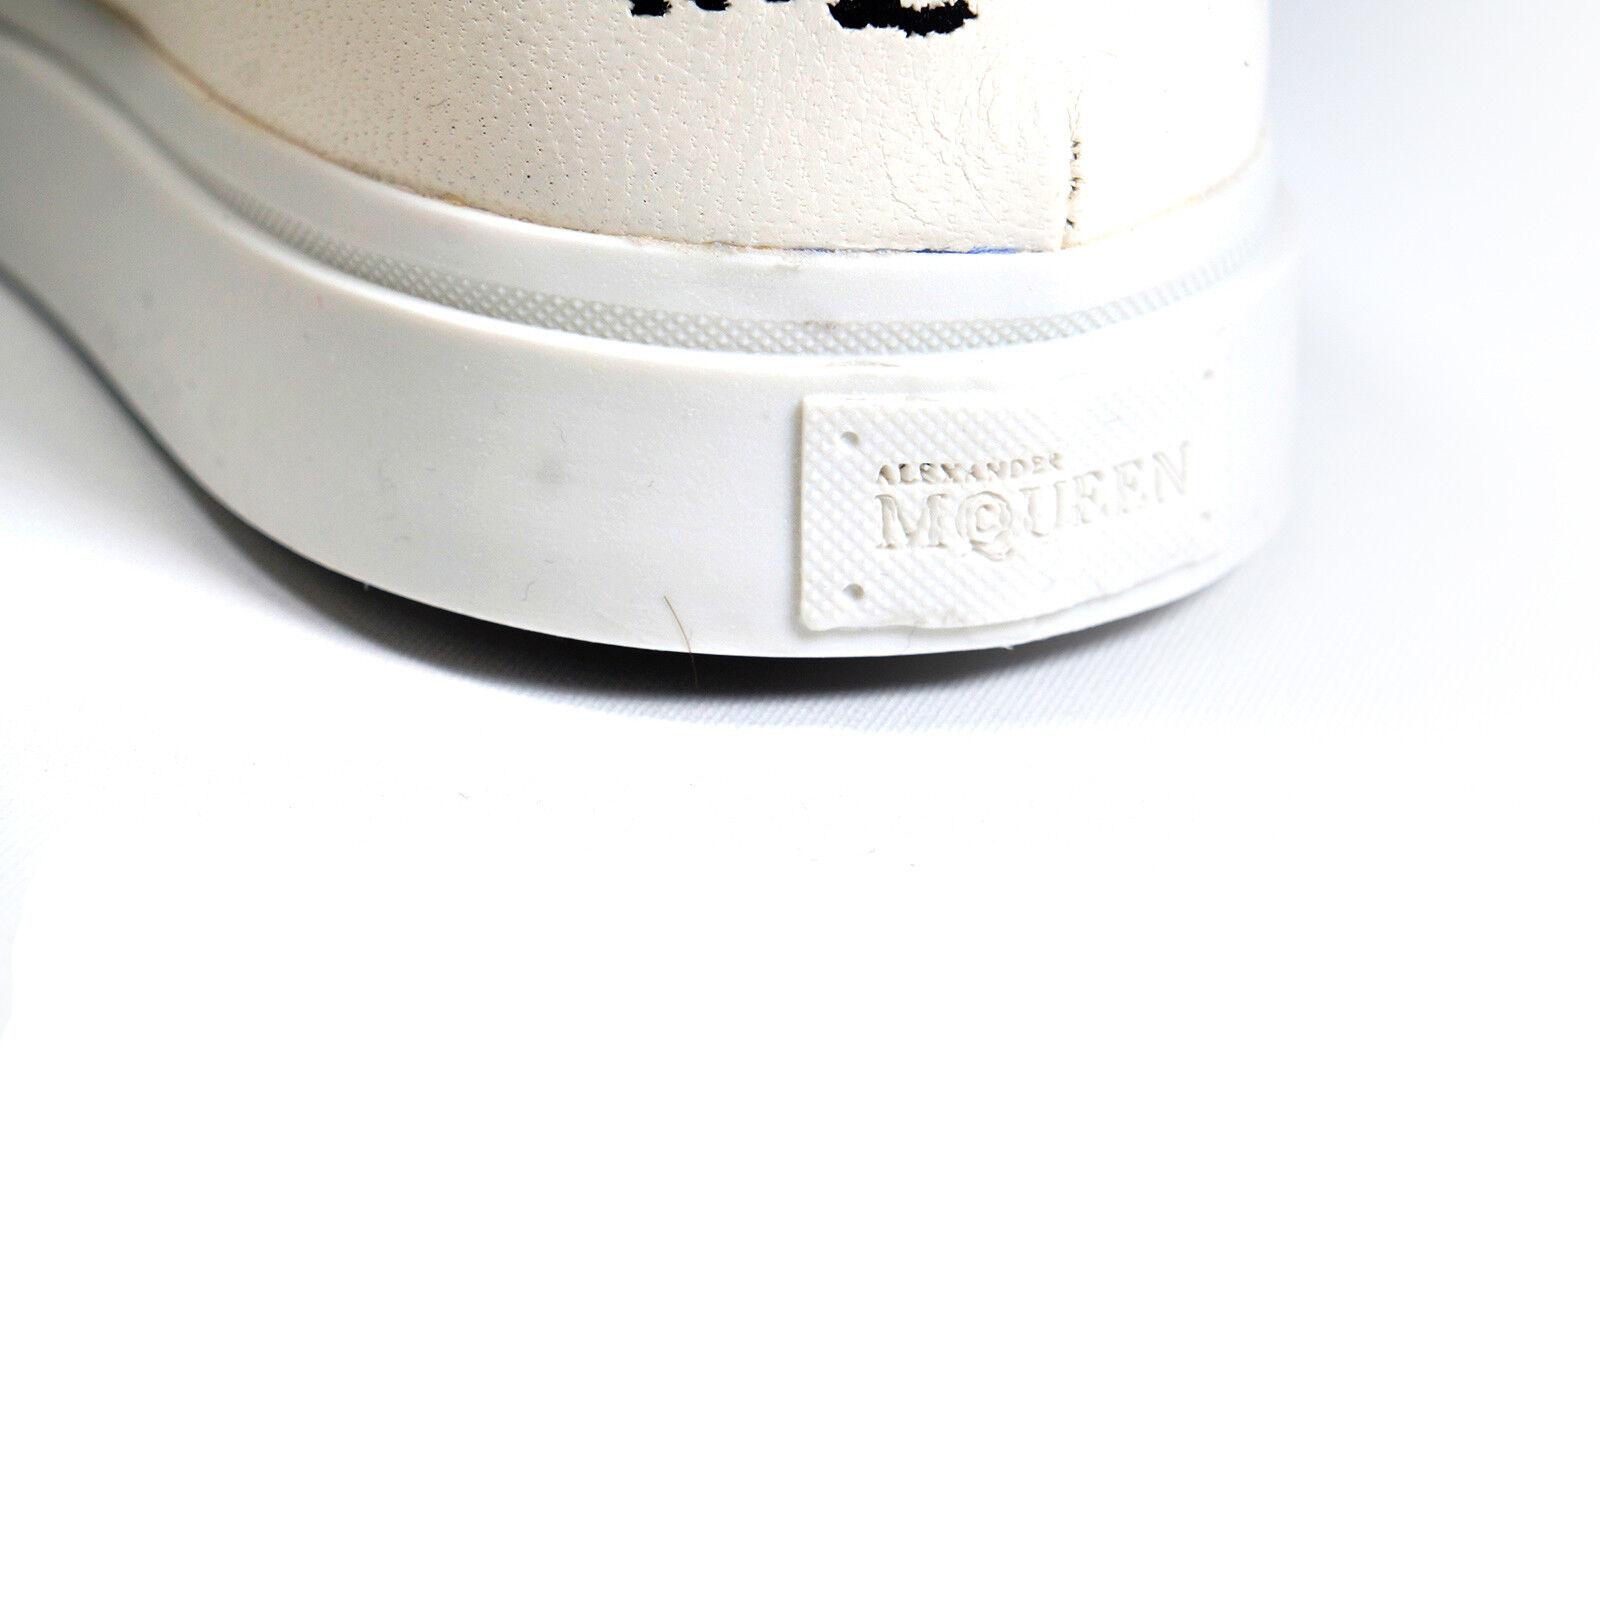 Ultra Rara Slip-on Alexander McQueen Plimsoll Pompe Slip-on Rara Piattaforma Scarpe da ginnastica di marca e20ed3